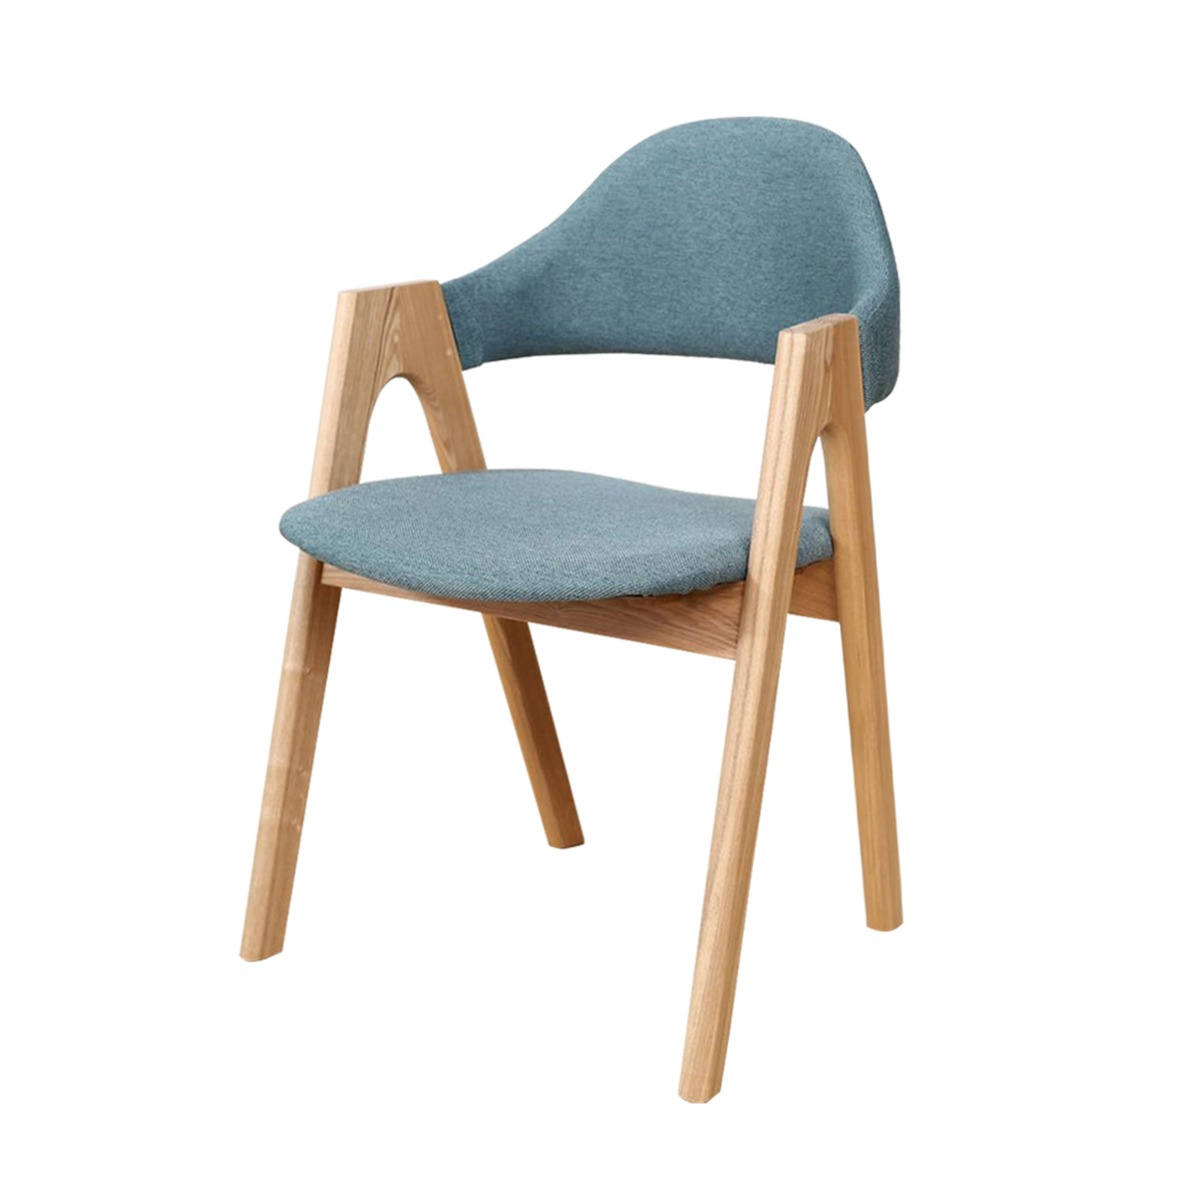 Brixham Oak & Fabric Dining Chair (Set of 2) in Light Blue